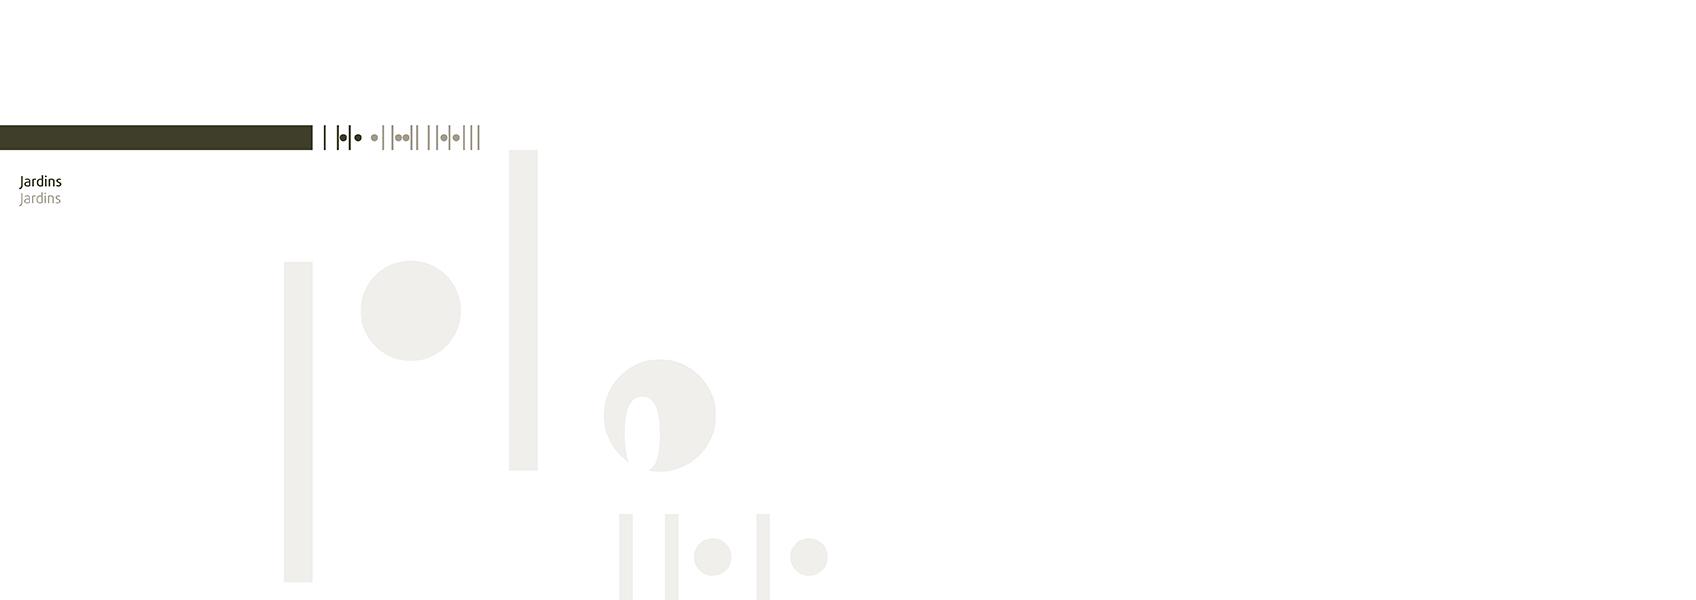 LoDo_03_5_120420-28